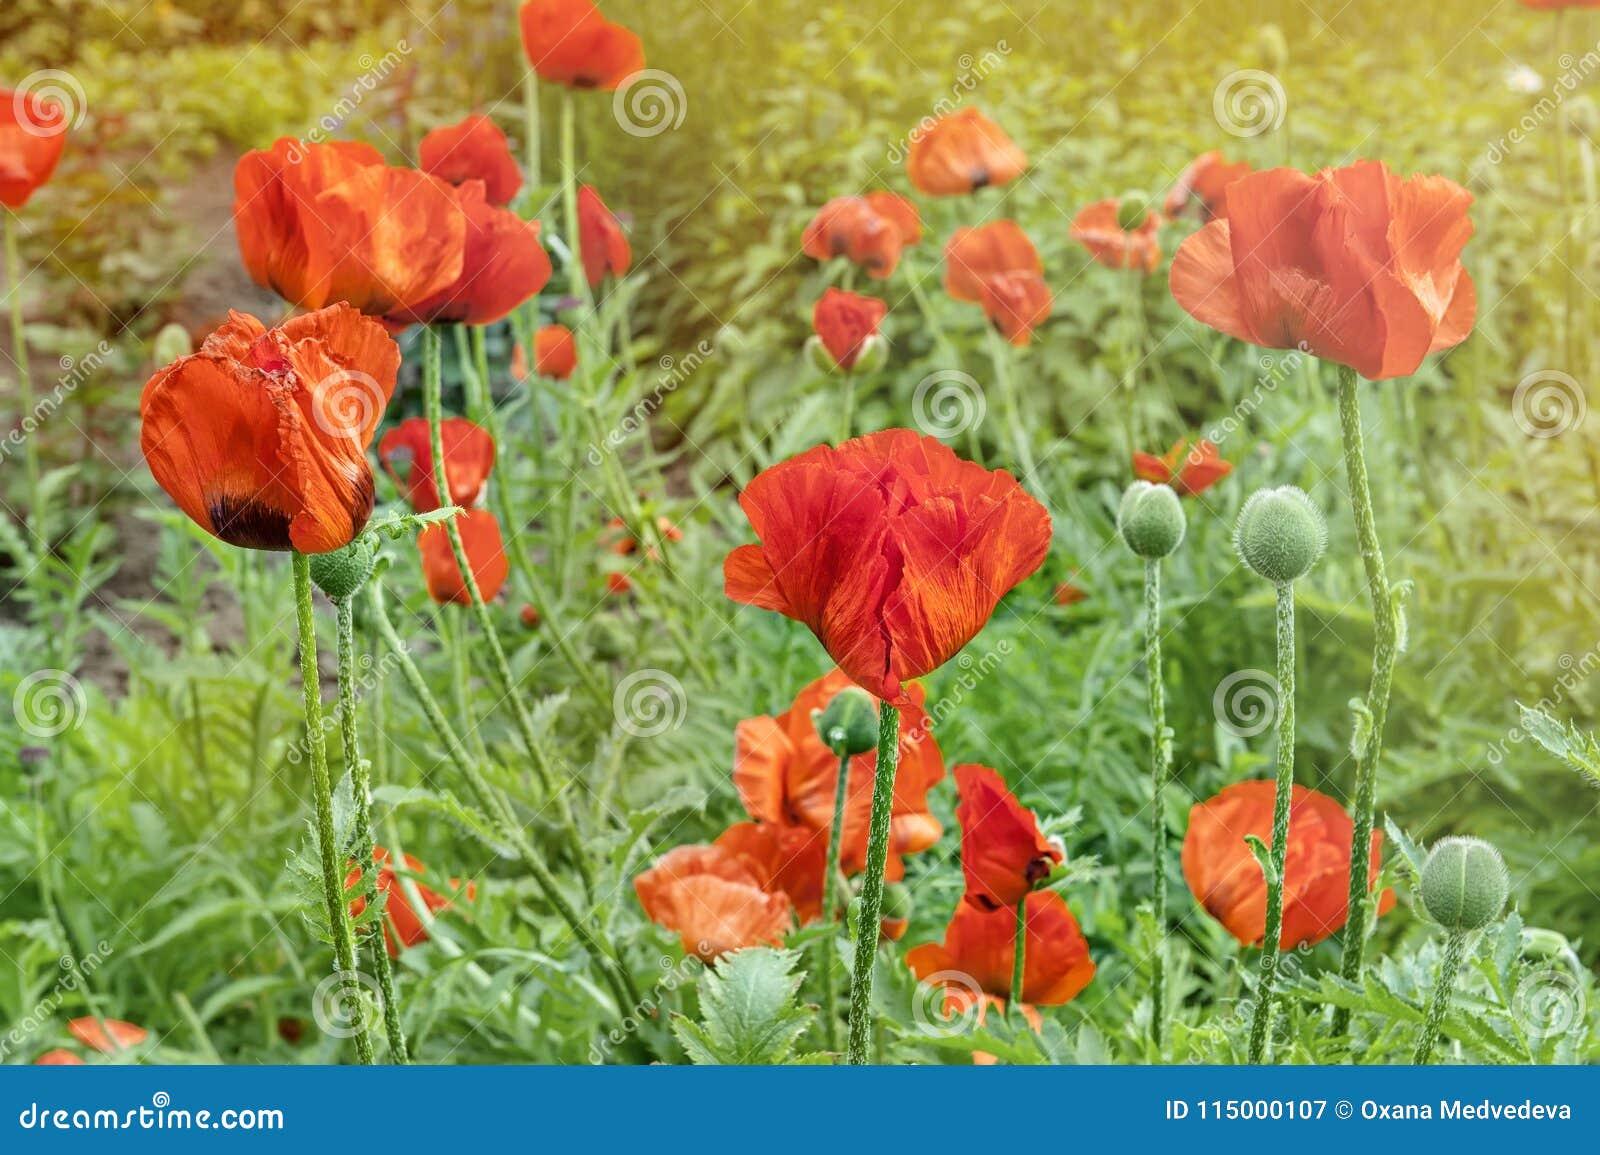 Red poppy flowers poppies in the garden poppy spring summer flower red poppy flowers poppies in the garden poppy spring summer flower mightylinksfo